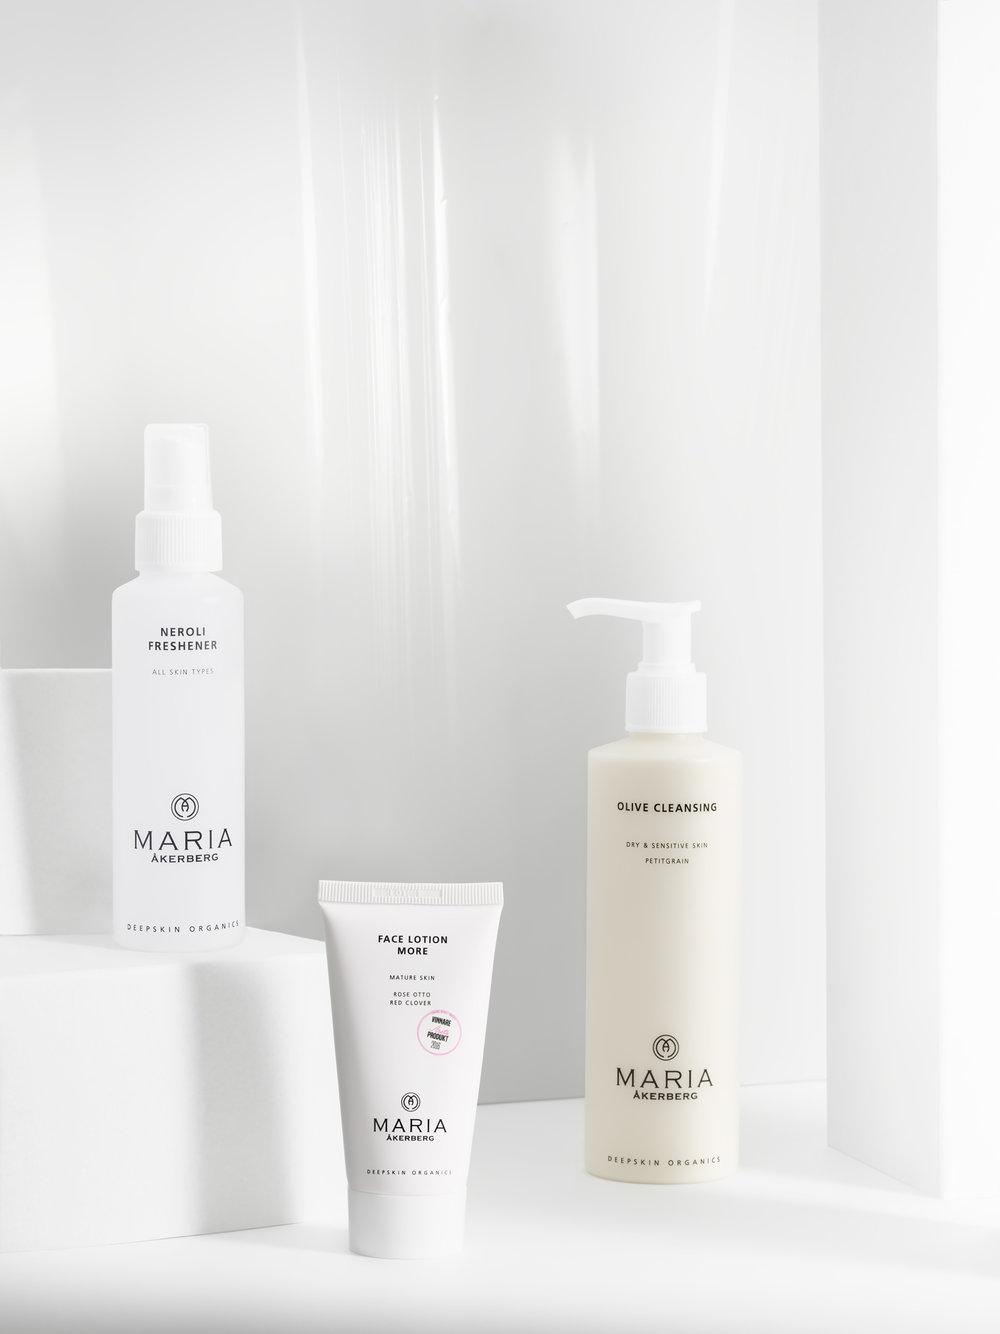 vegafoto-maria åkerberg-m&m nail & beautycenter-1.jpg